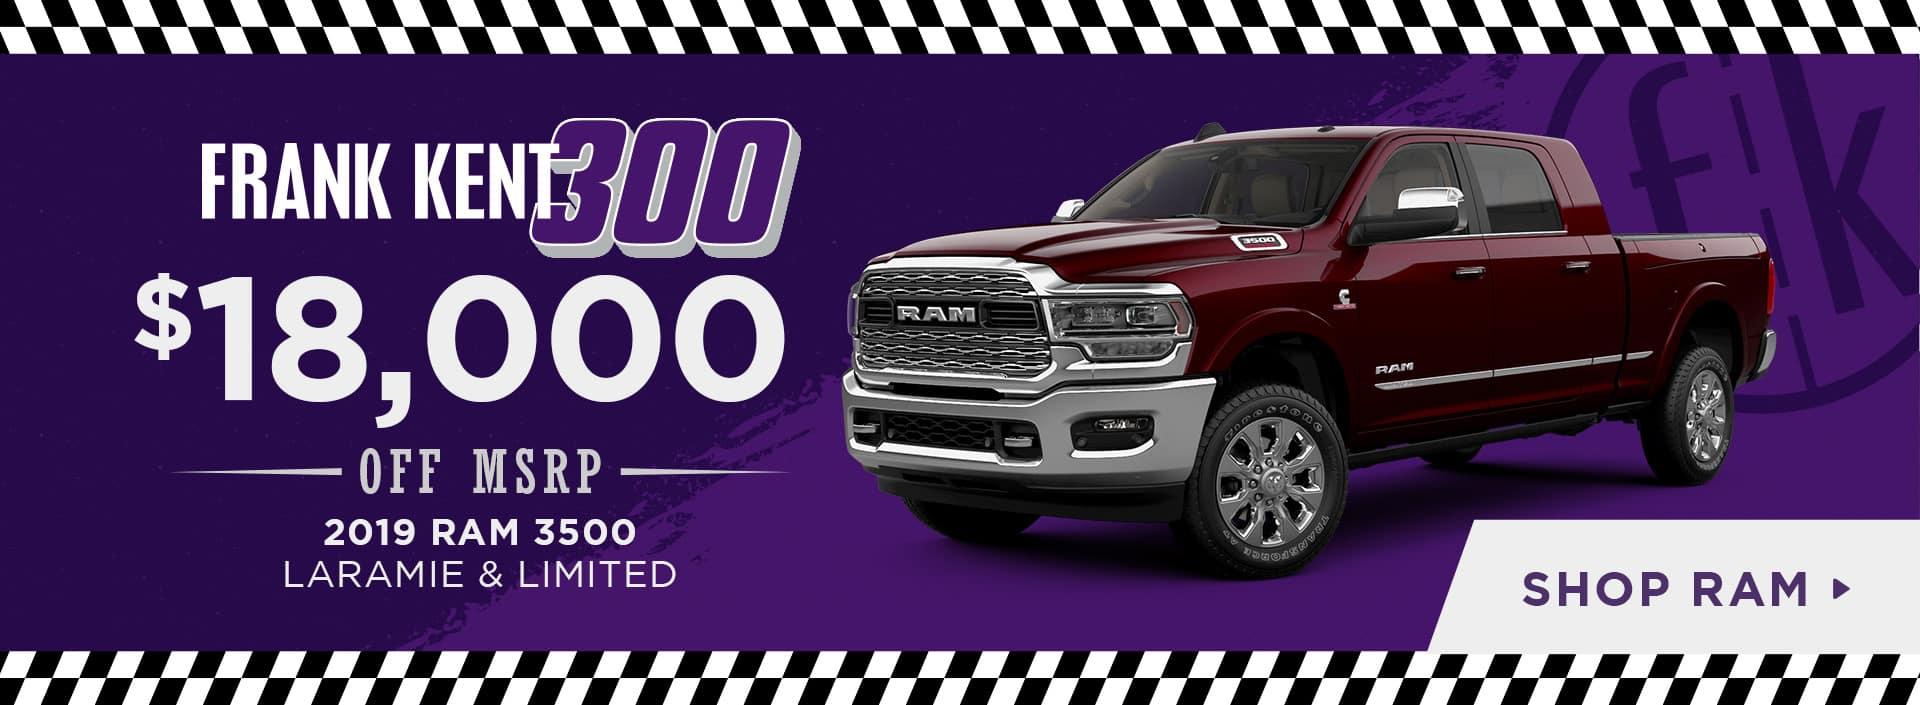 $18,000 OFF 2019 RAM 3500 LARAMIE & LIMITED